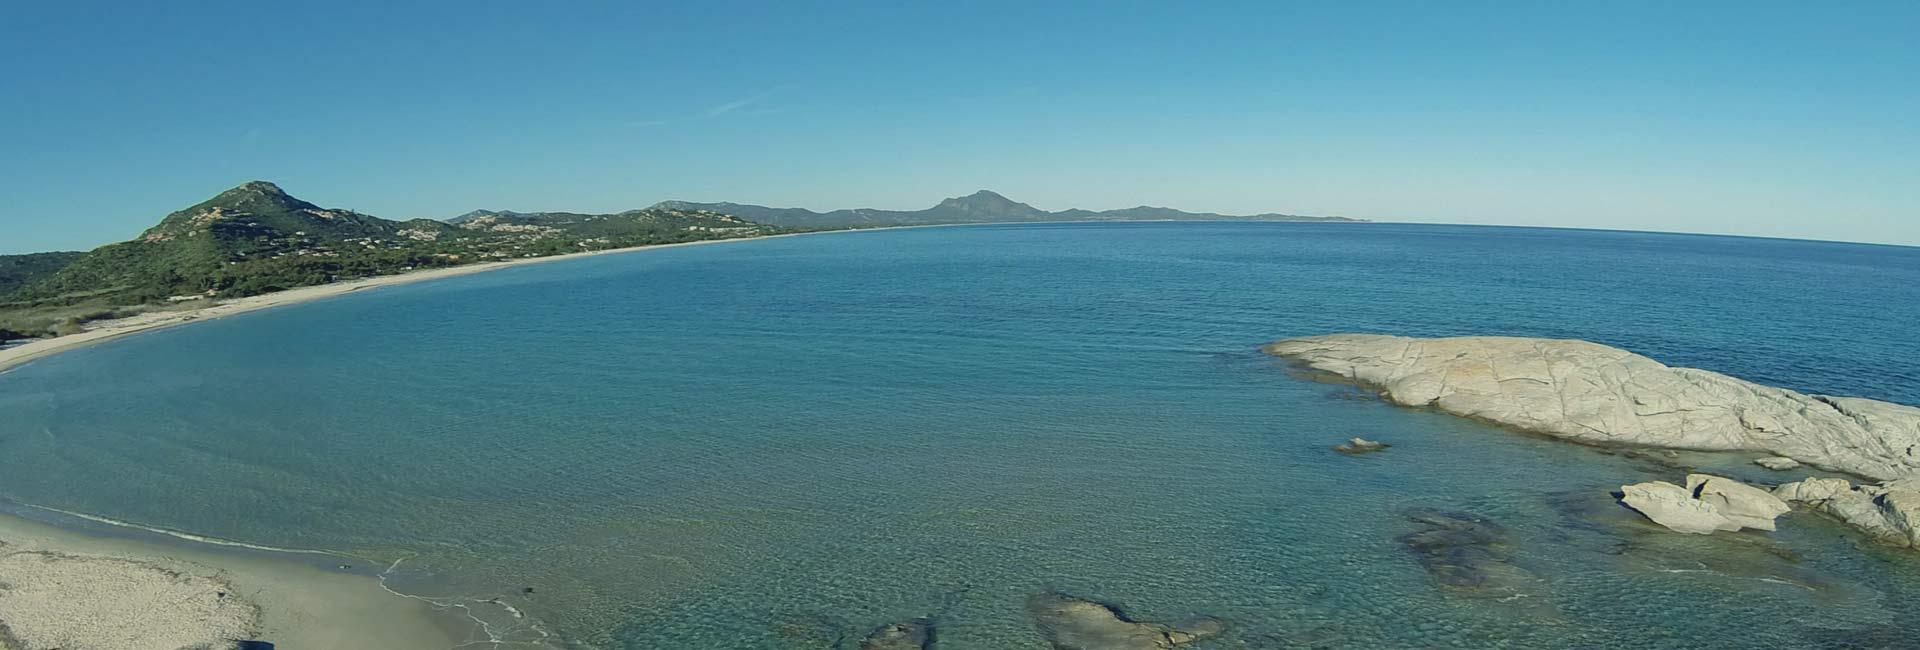 Costa Rei Panorama